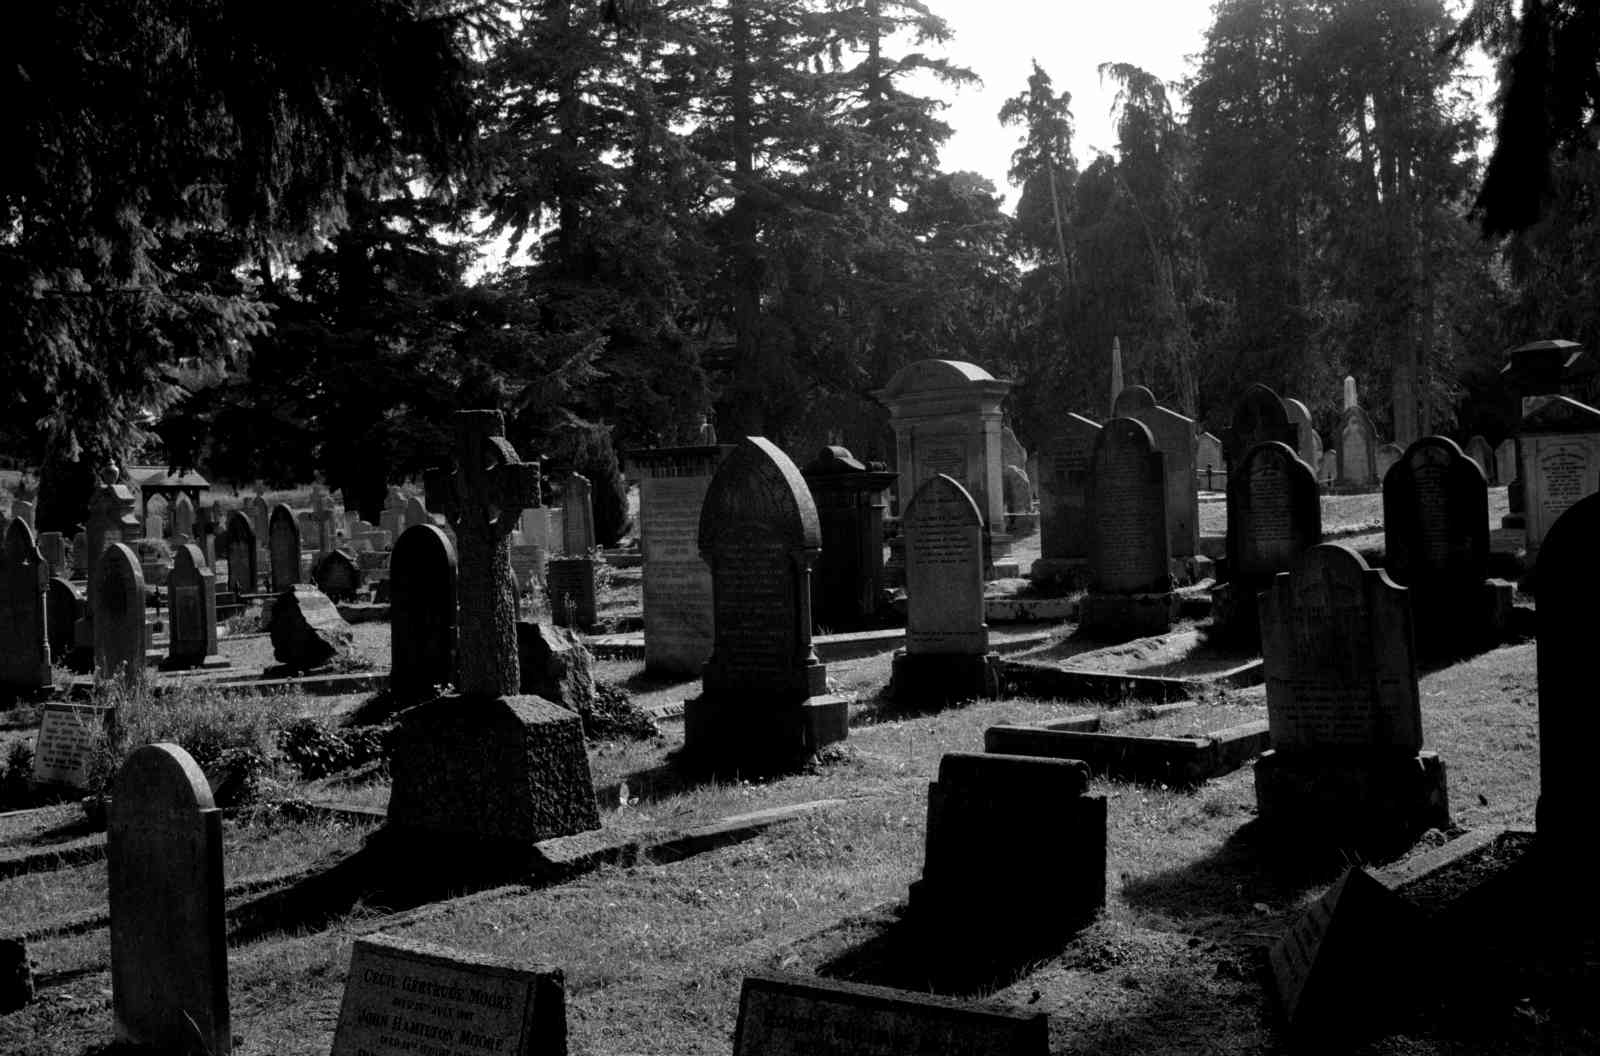 Friedhof Enniskerry 02, Rollei35 Ilford HP5 400